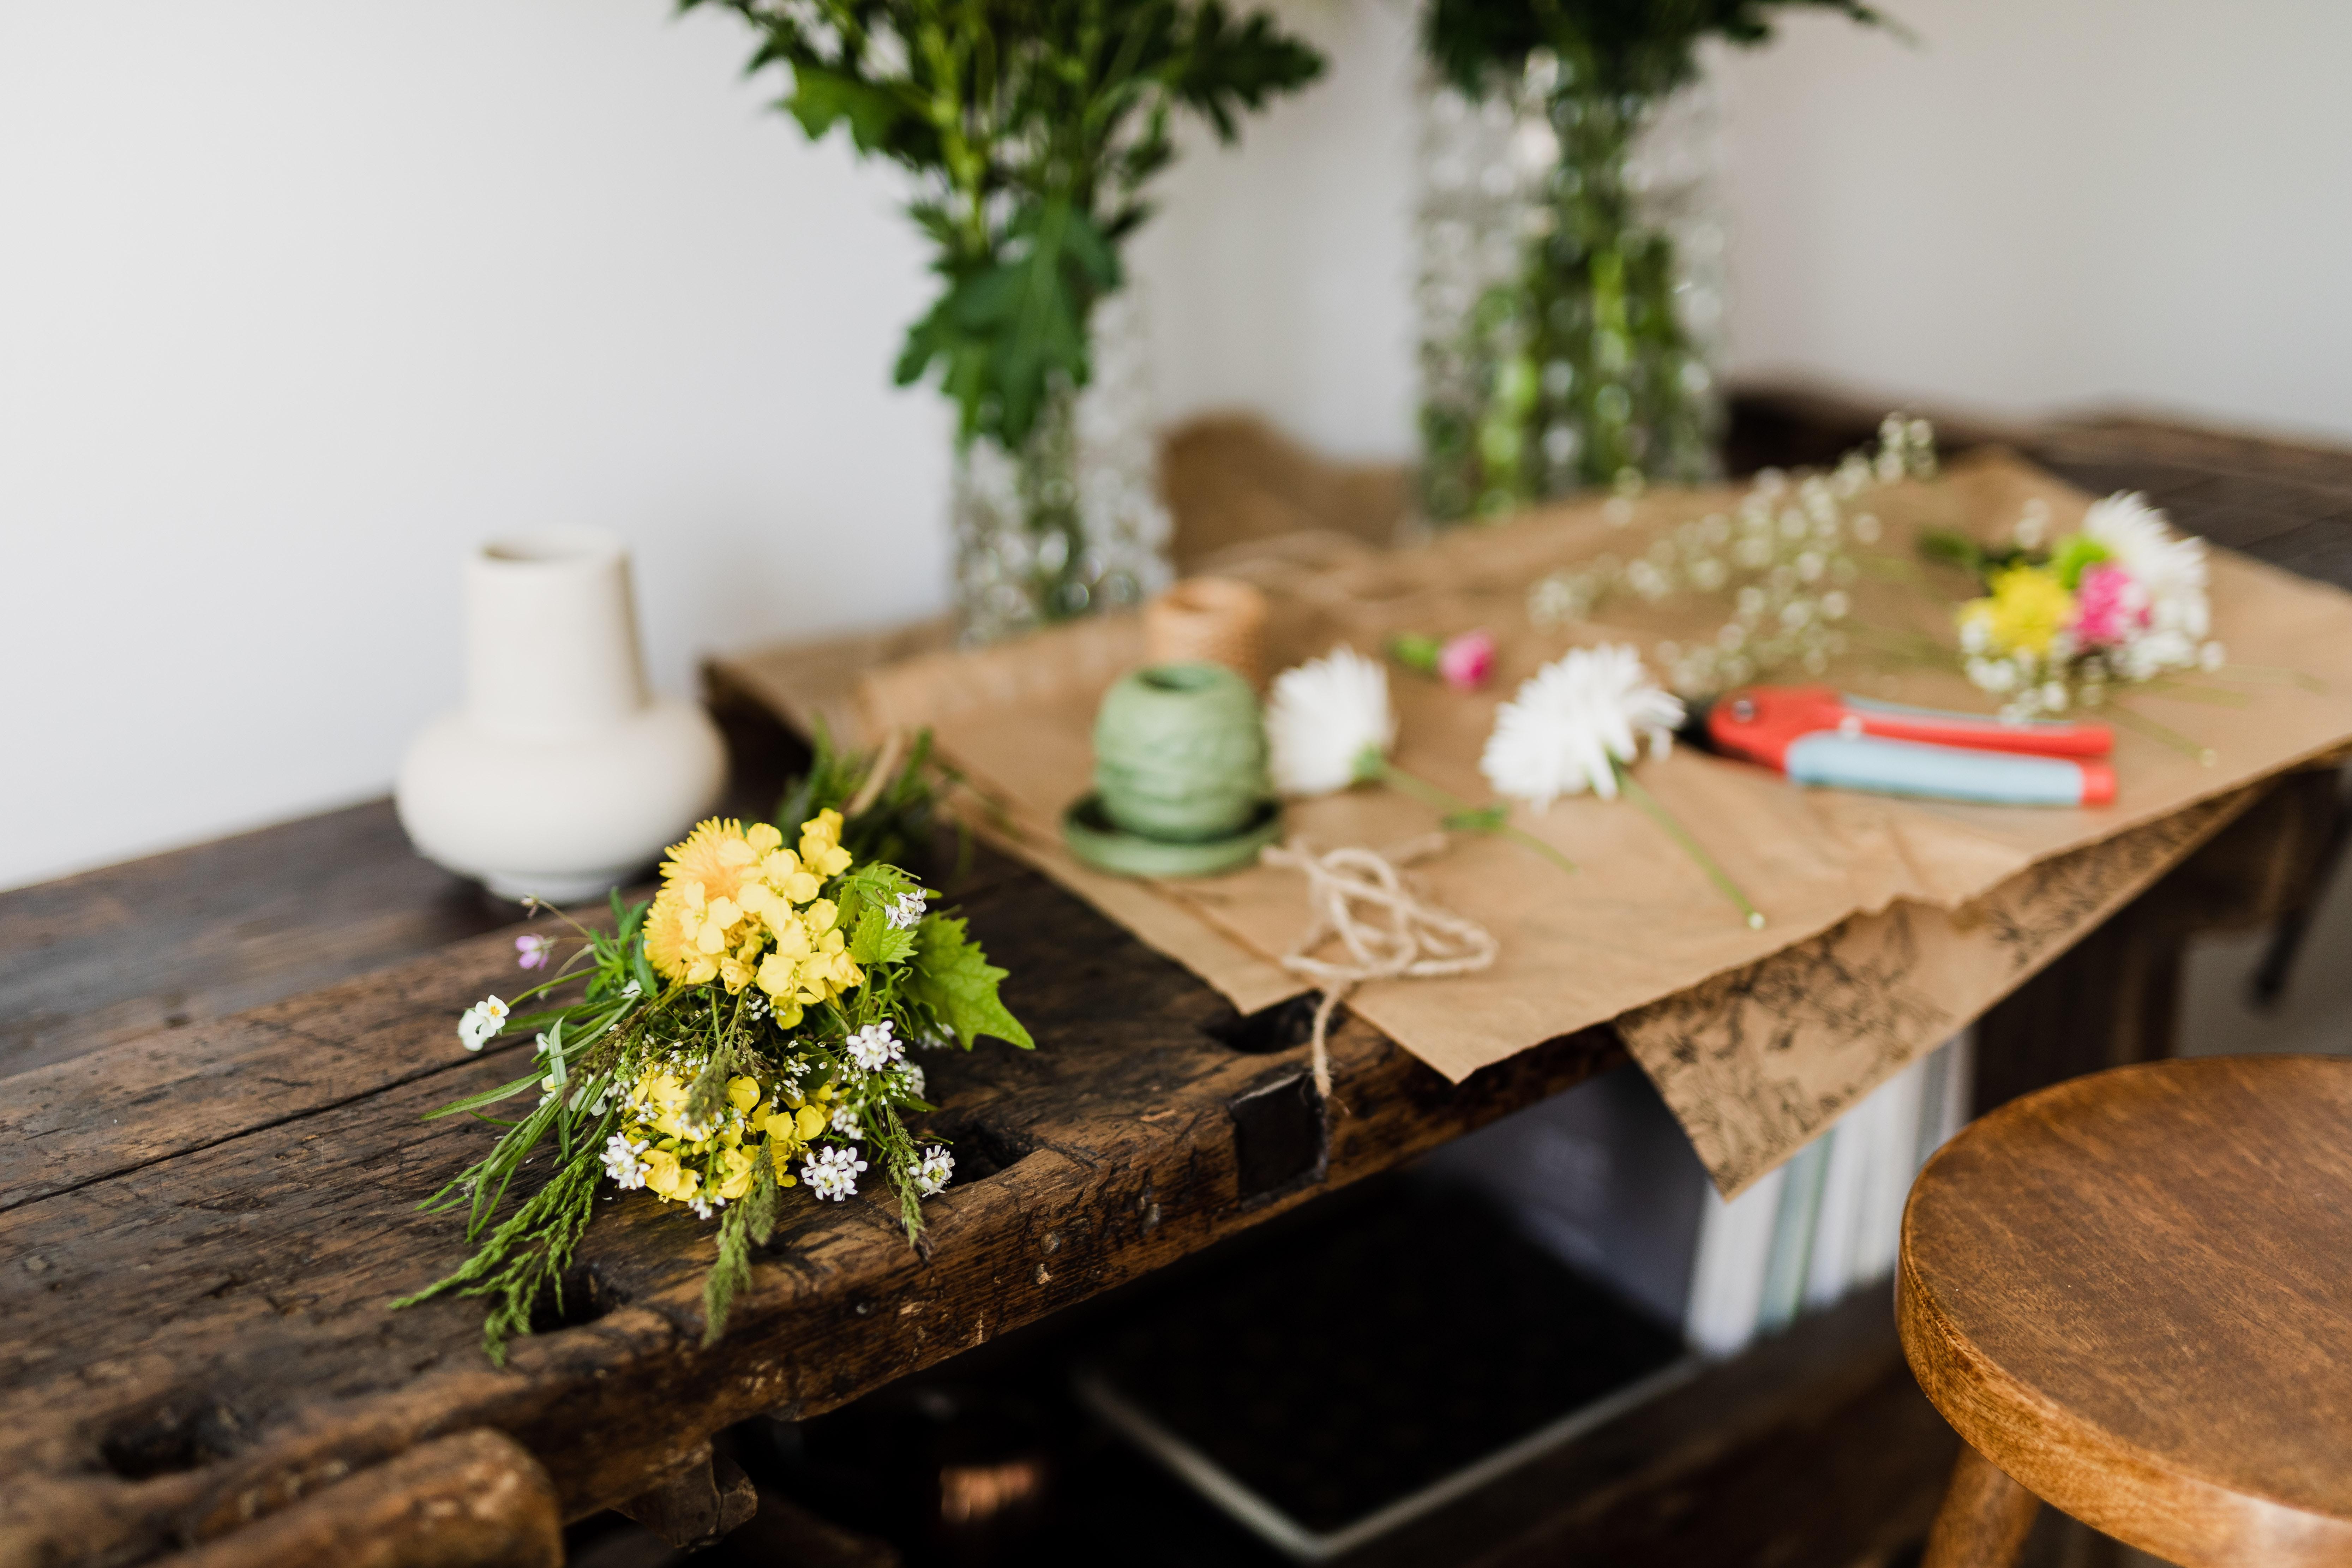 6 Cara Merangkai Bunga Sendiri Di Rumah Ternyata Gampang Rumah123 Com